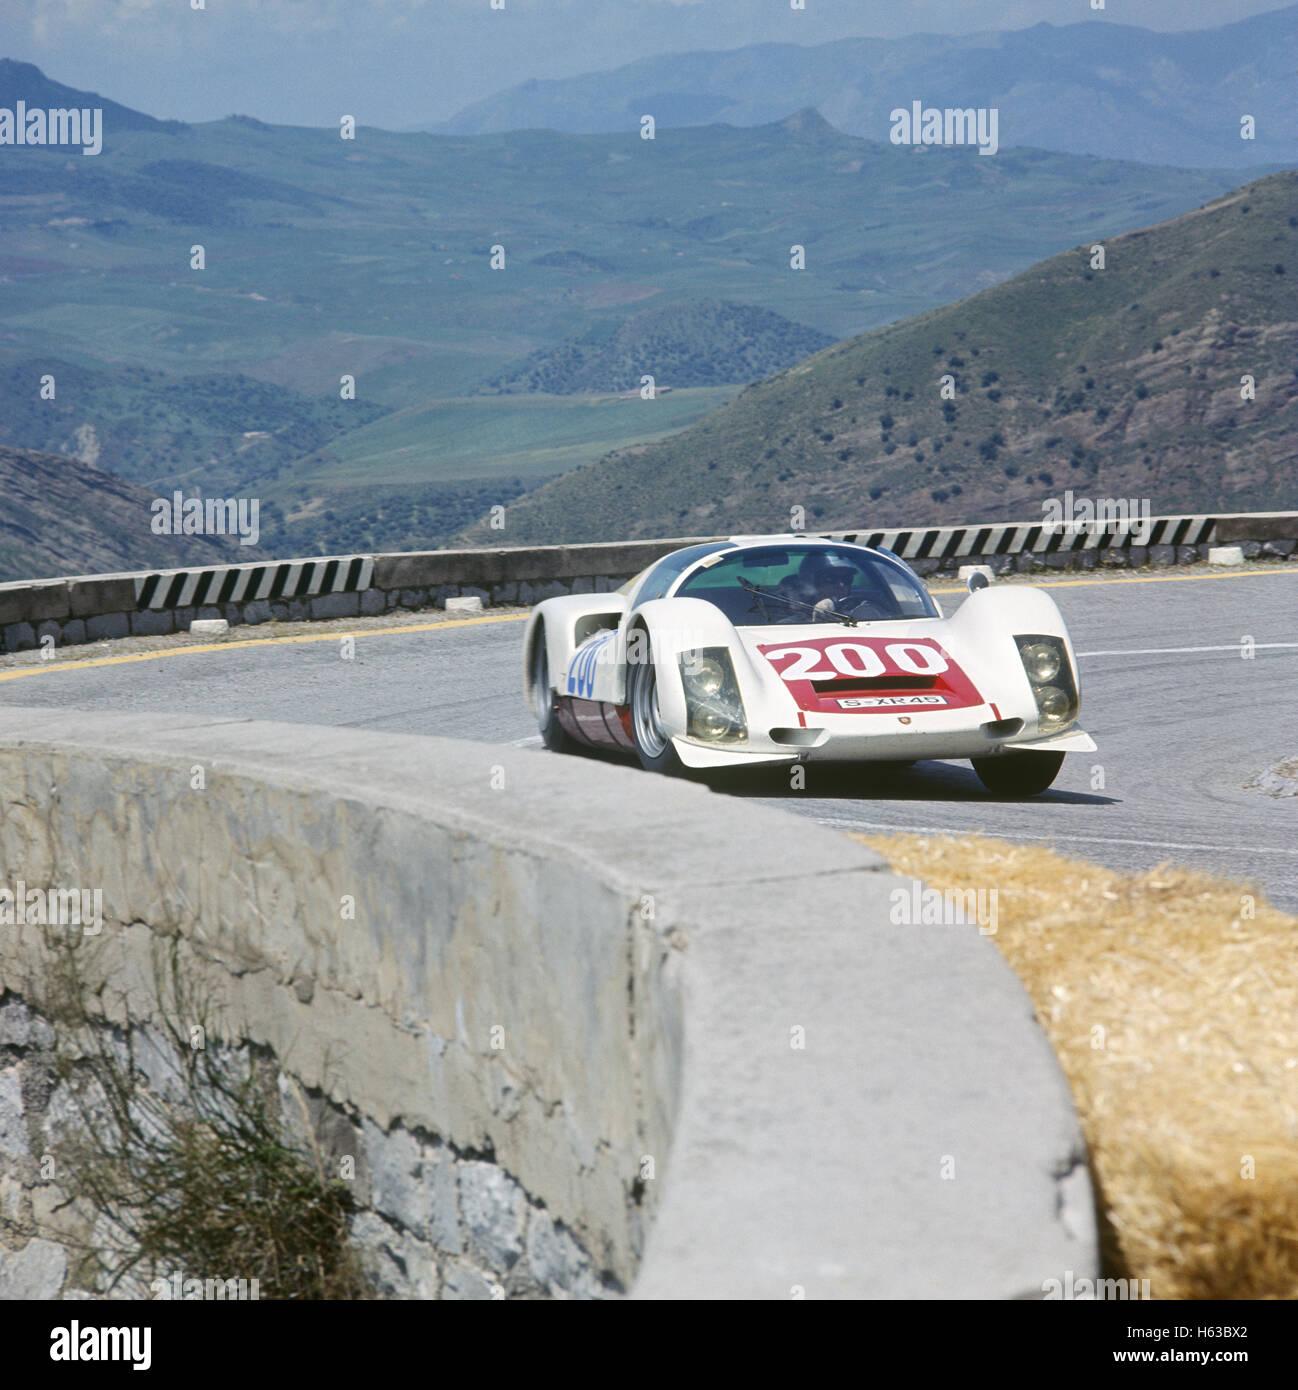 200 Hans Herrmann and Dieter Glemser in a  Porsche 906 retired from the Targa Florio 8 May 1966 - Stock Image